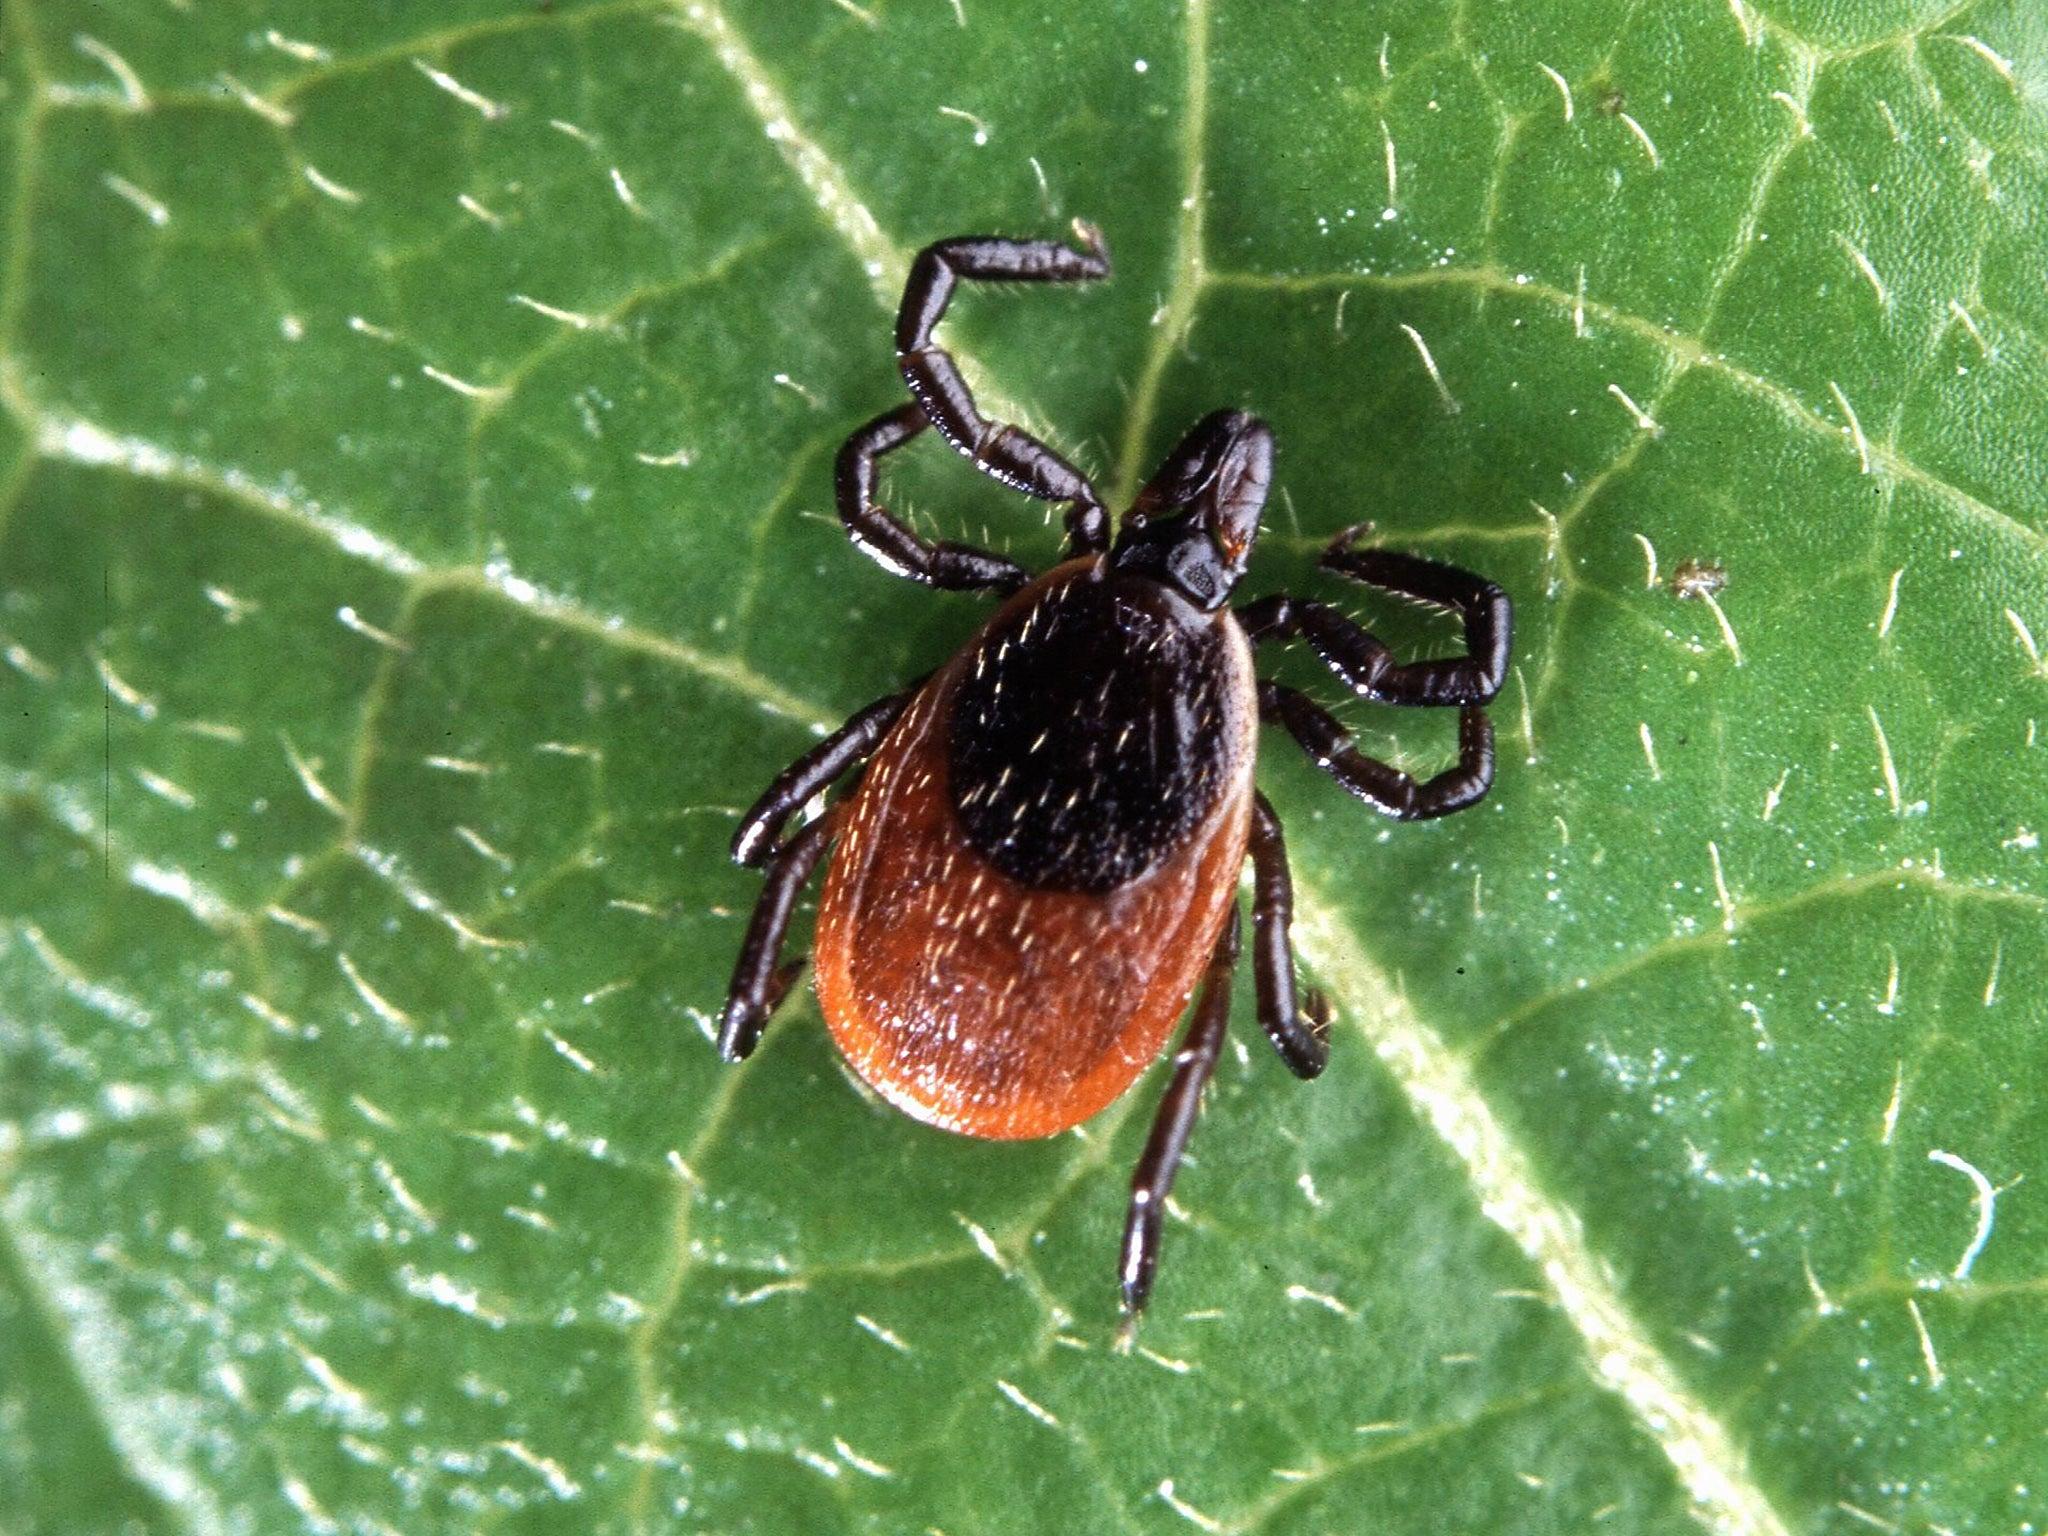 Insect killers: tick-borne encephalitis